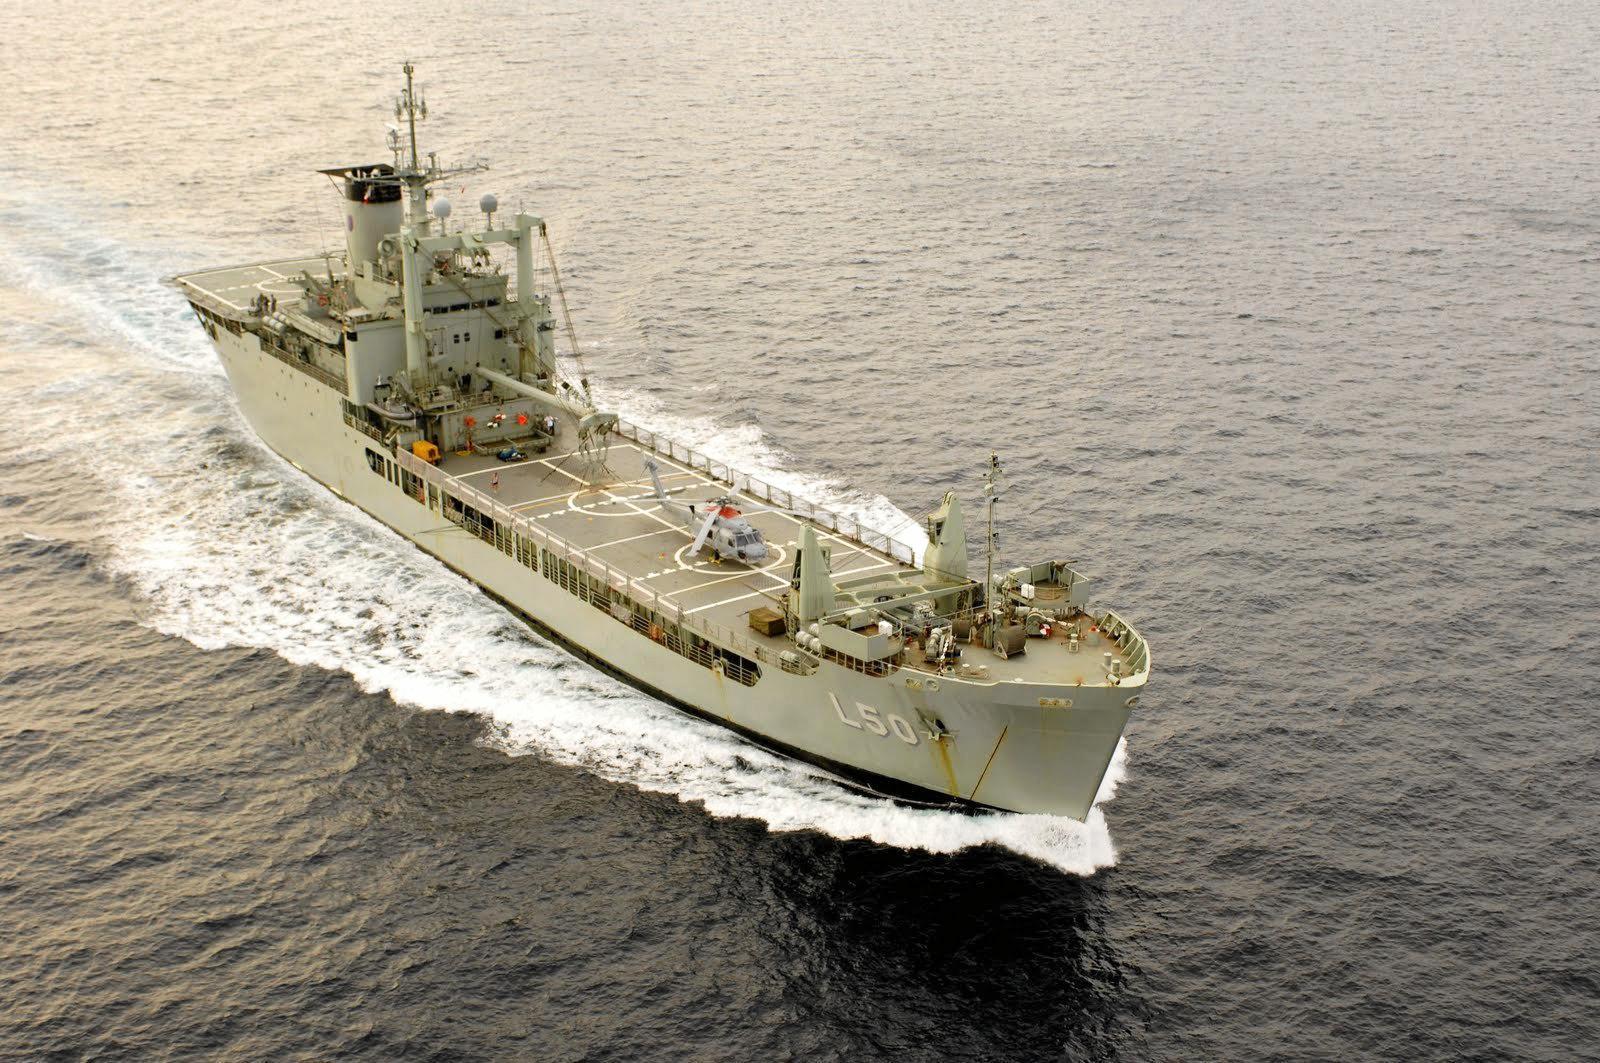 HMAS Tobruk at sea. Photo: contributed